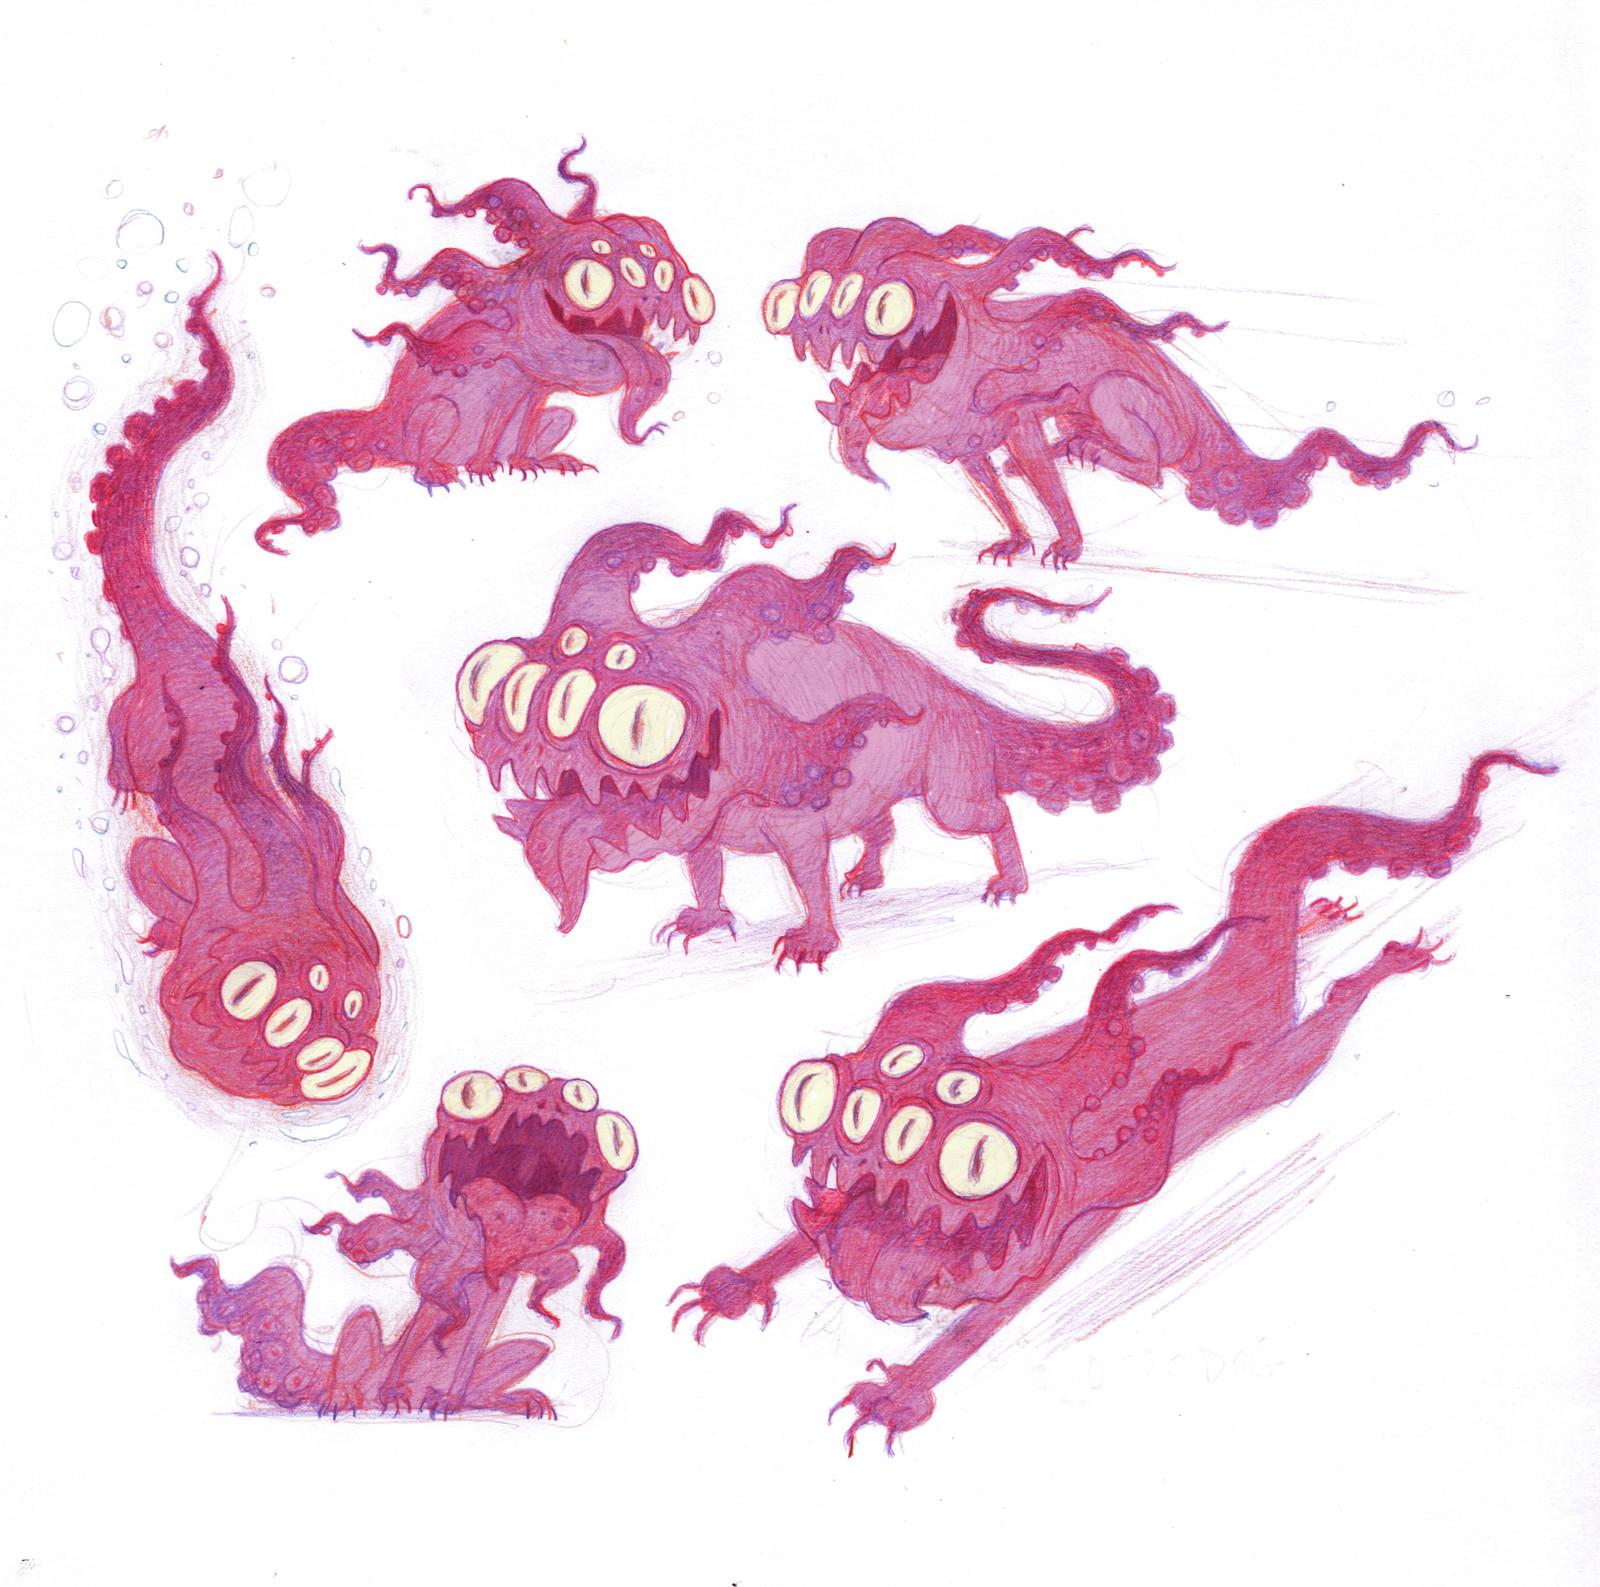 Octo Dog